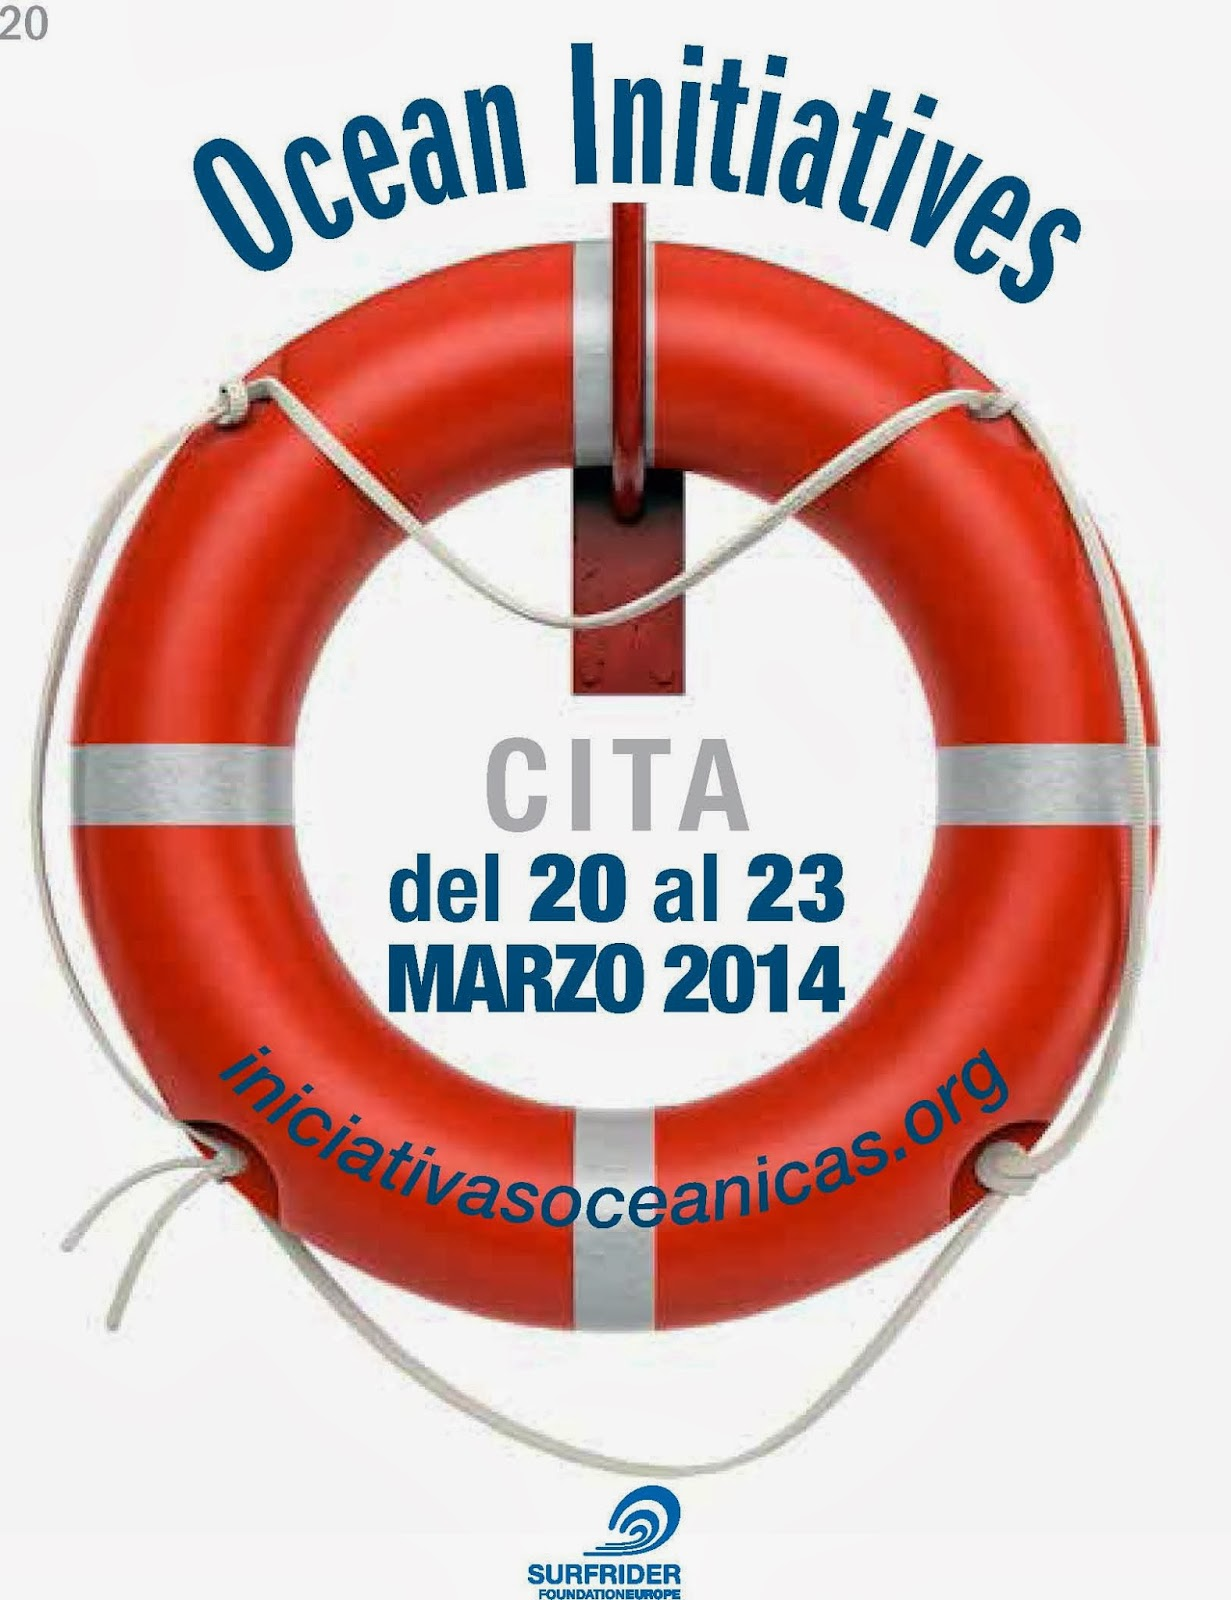 iniciativas oceanicas org